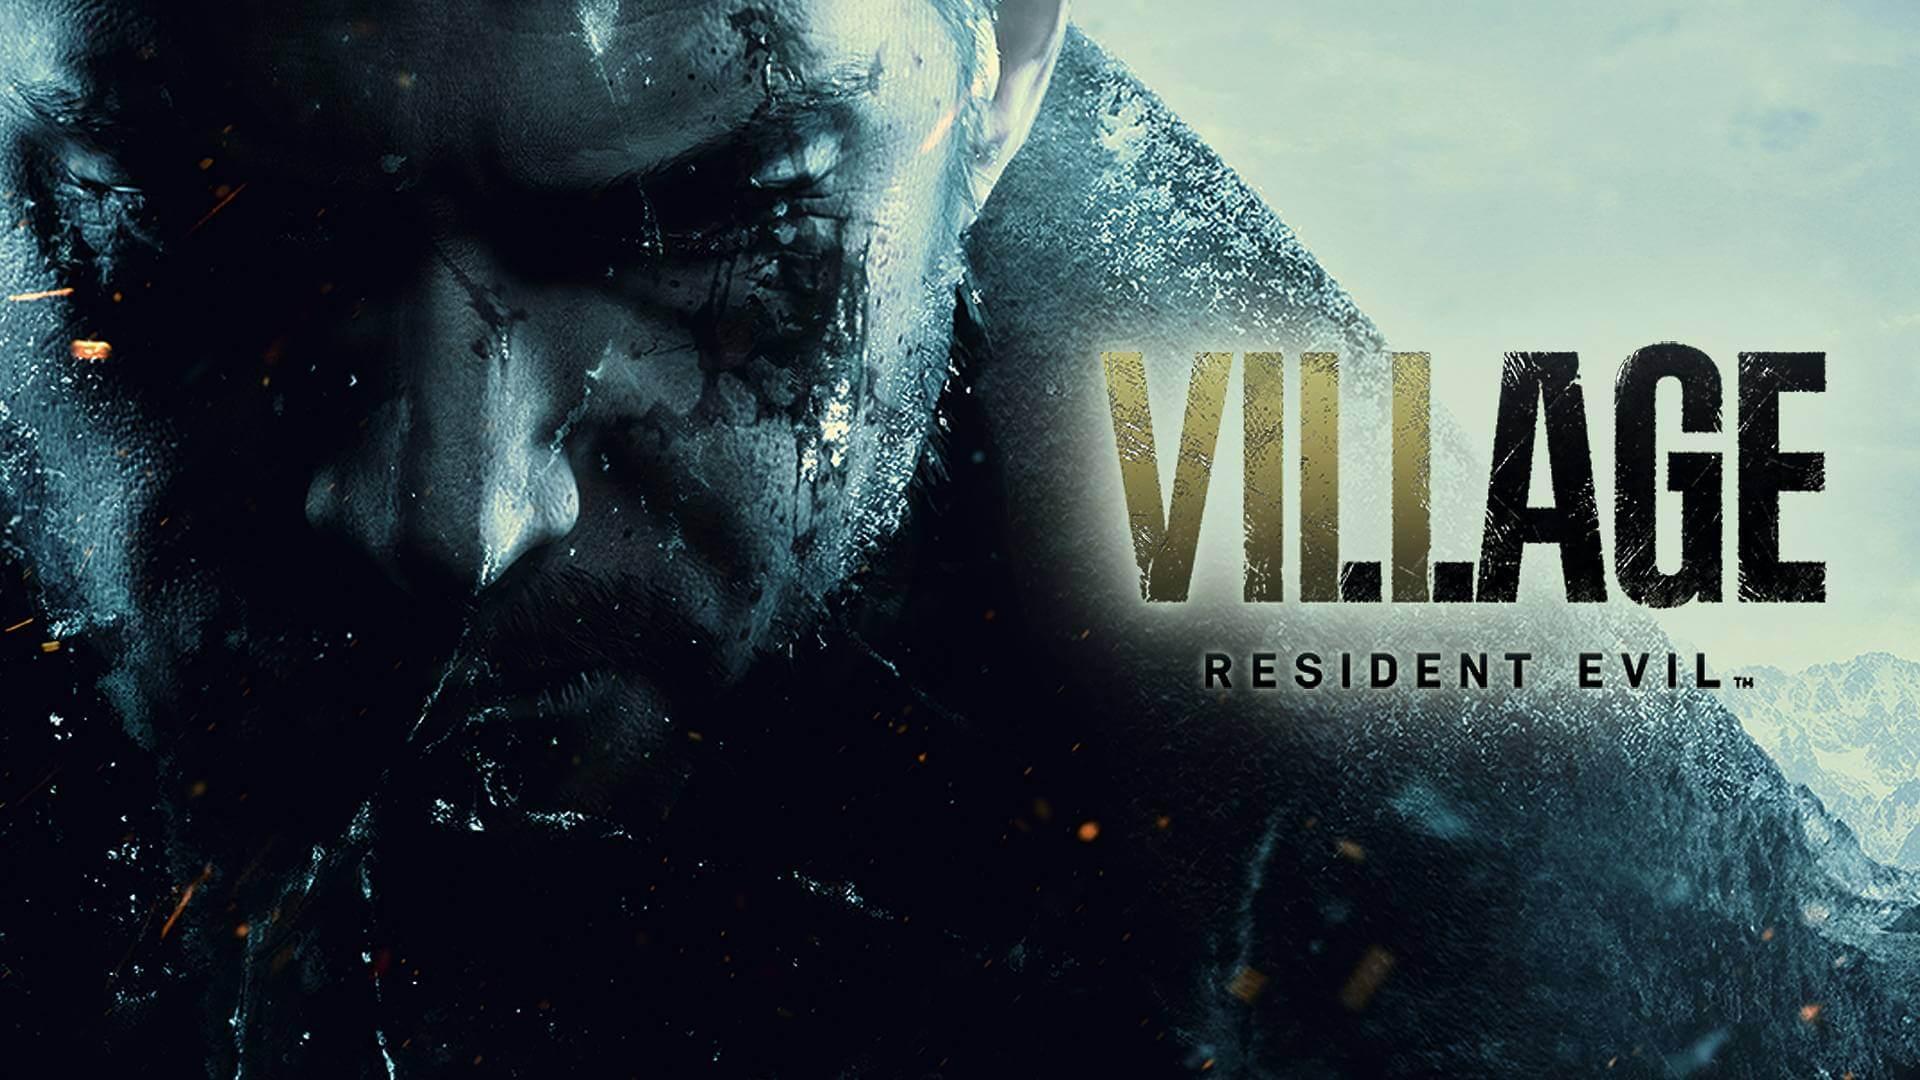 Resident Evil Village ha vendido 4,5 millones de unidades